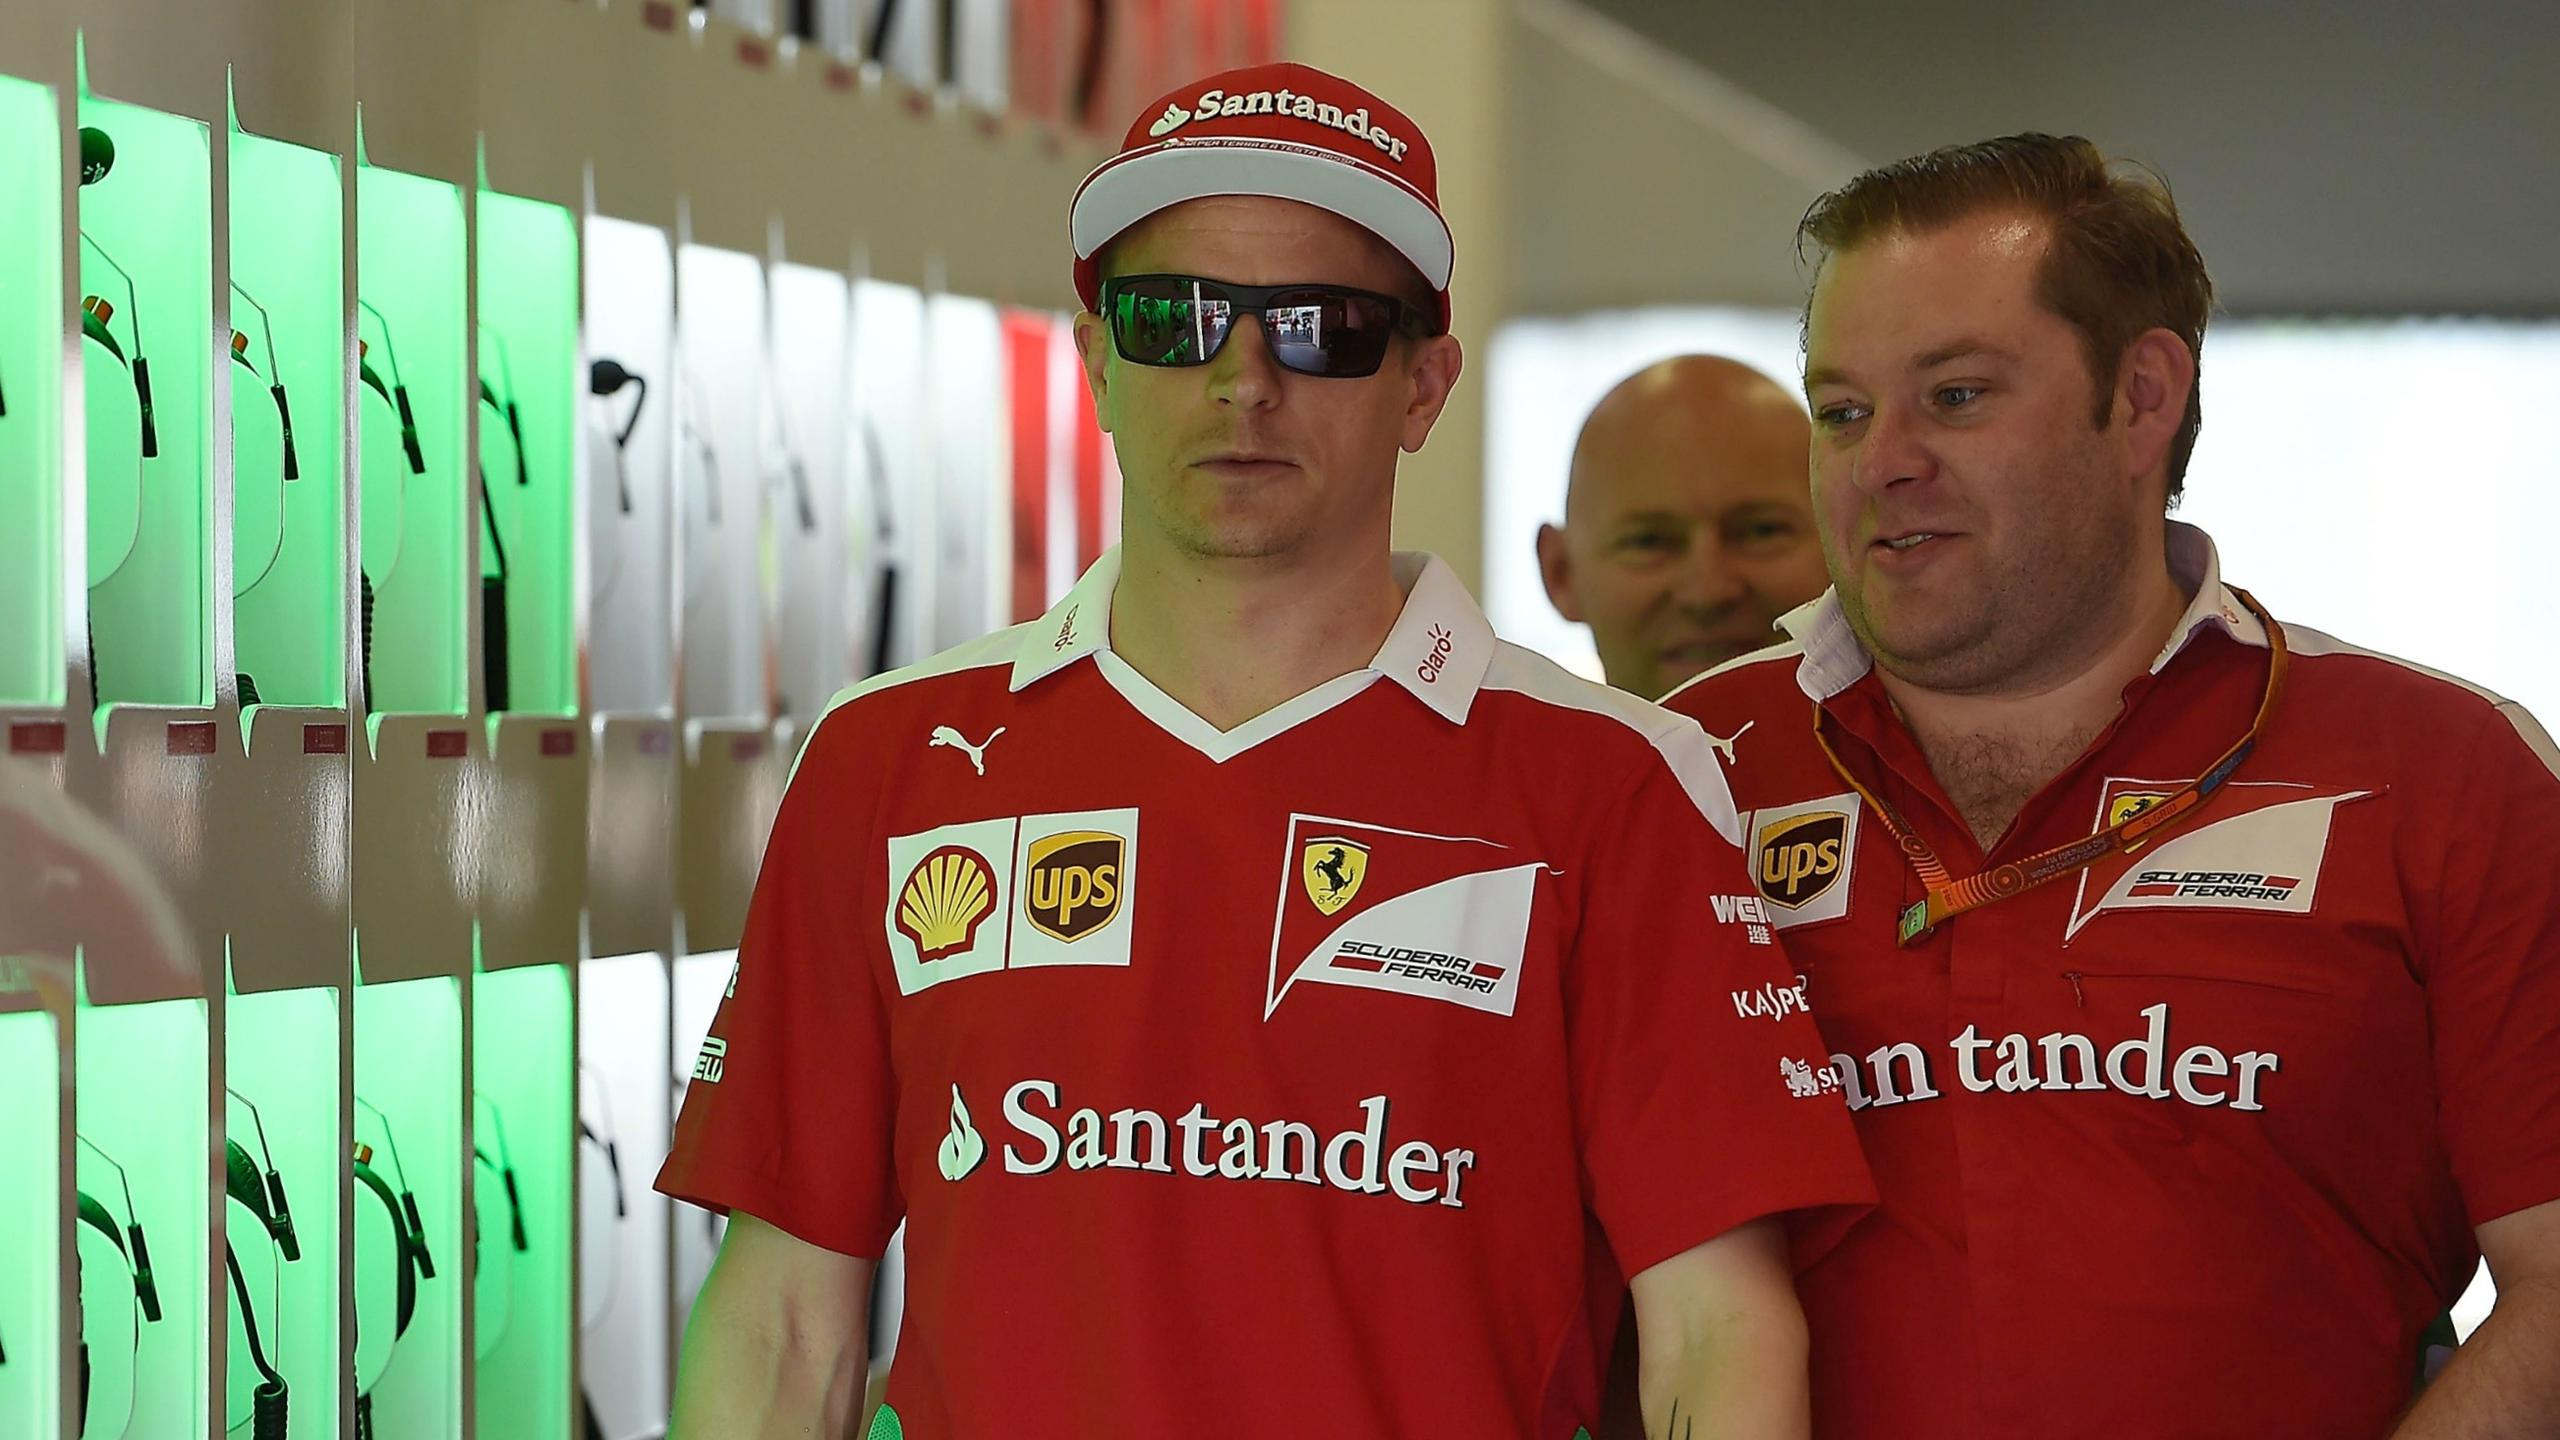 Kimi Räikkönen (Ferrari) au Grand Prix d'Europe 2016